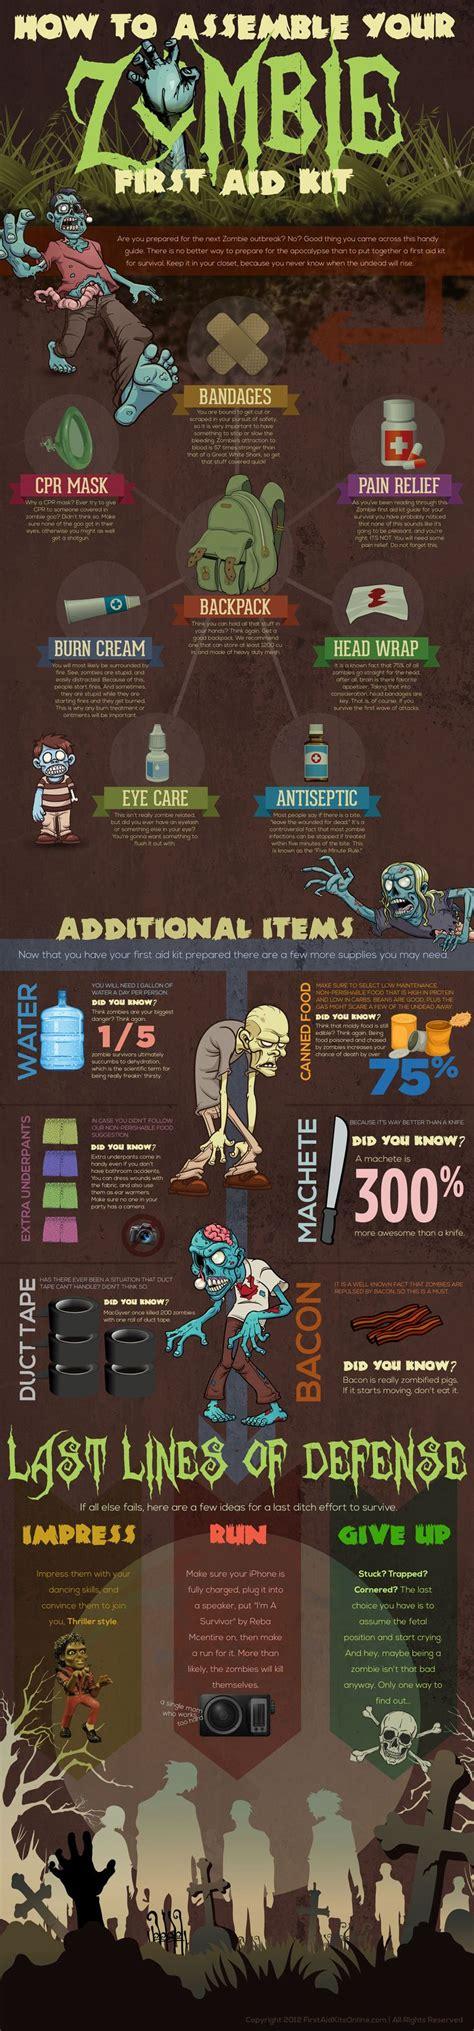 apocalypse zombie guide